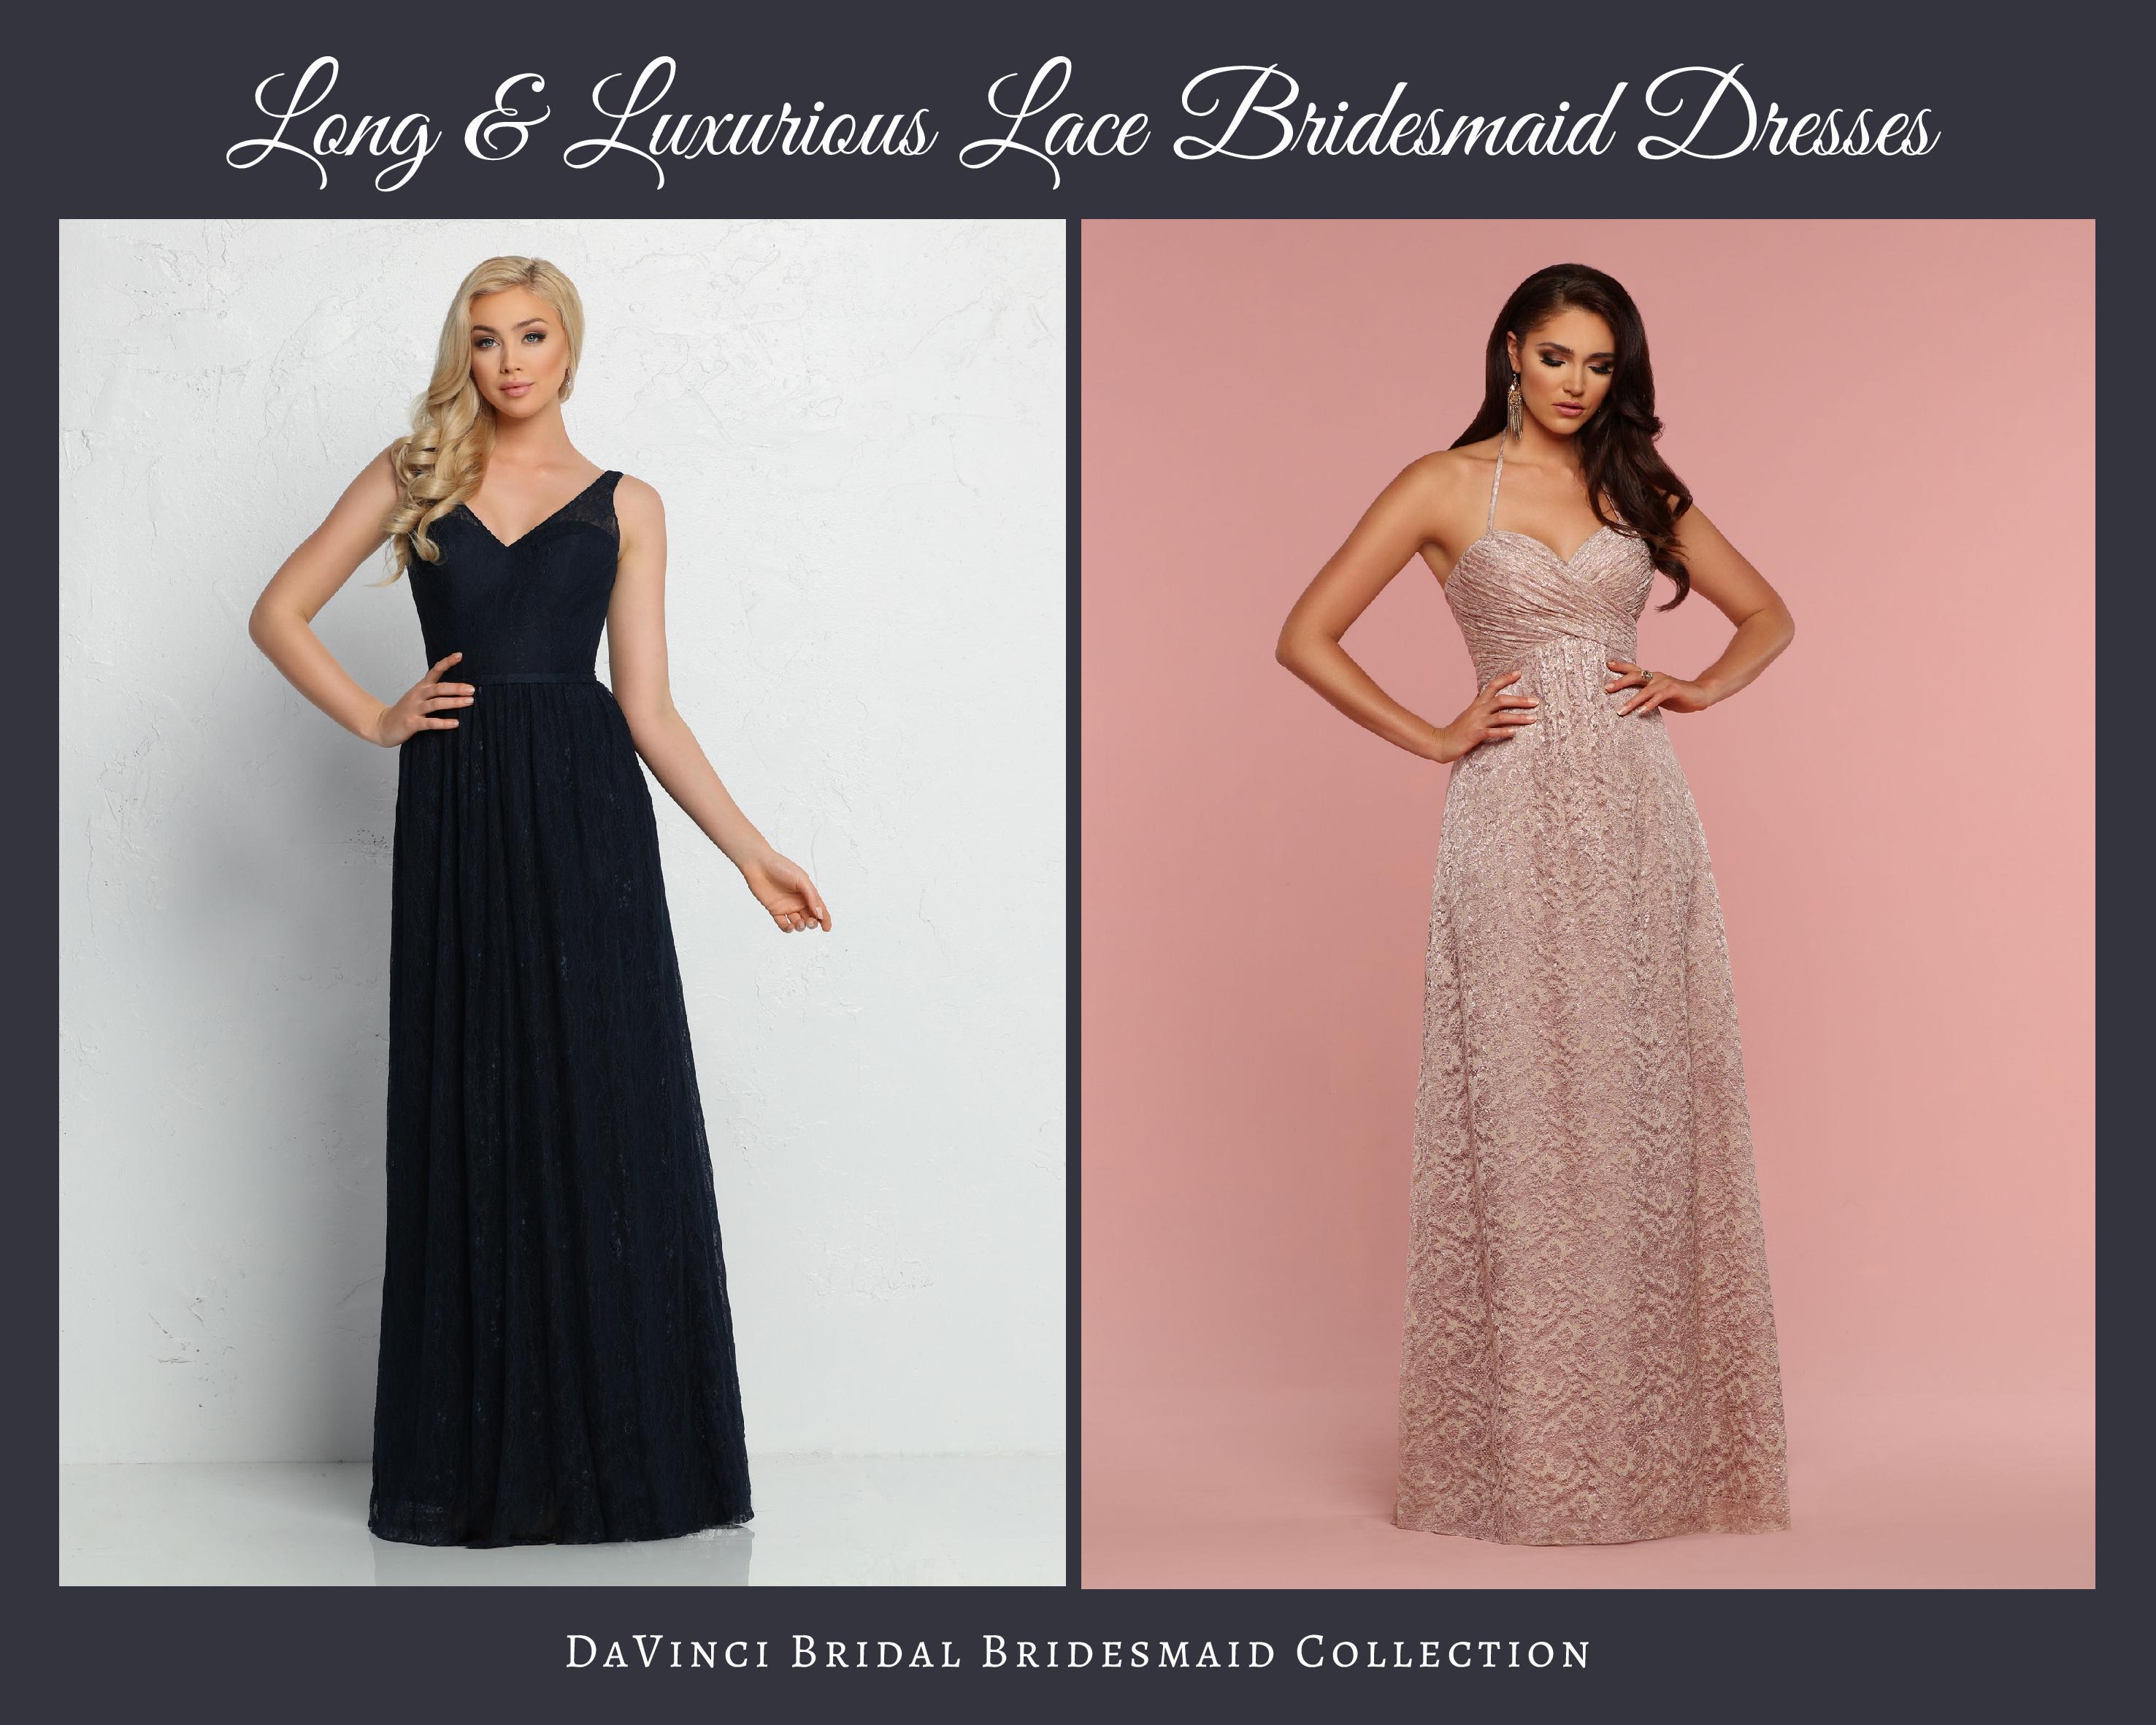 Luxurious Long Lace Bridesmaid Dresses – DaVinci Bridal Fashion Blog